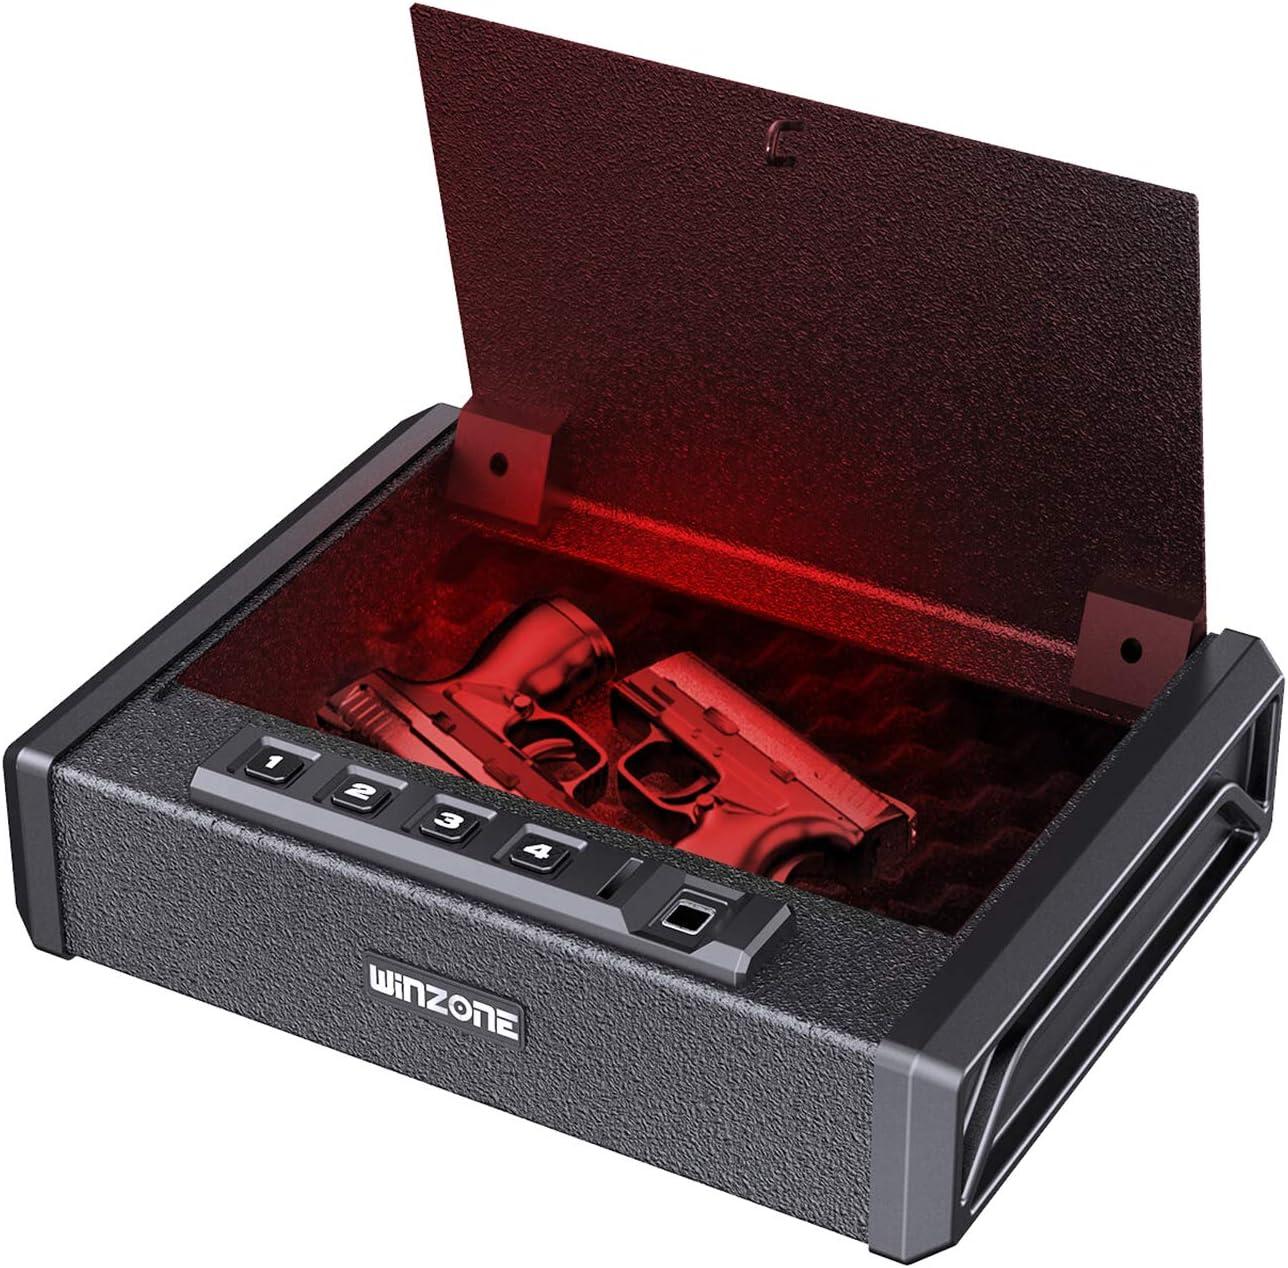 Gun Safe - Biometric Gun Safes for Pistols Quick Access Smart Handgun Safe Firearm Safety Device with Fingerprint,Keypad and Key Lock, Pistol Safe Box for Home Bedside Nightstand Car